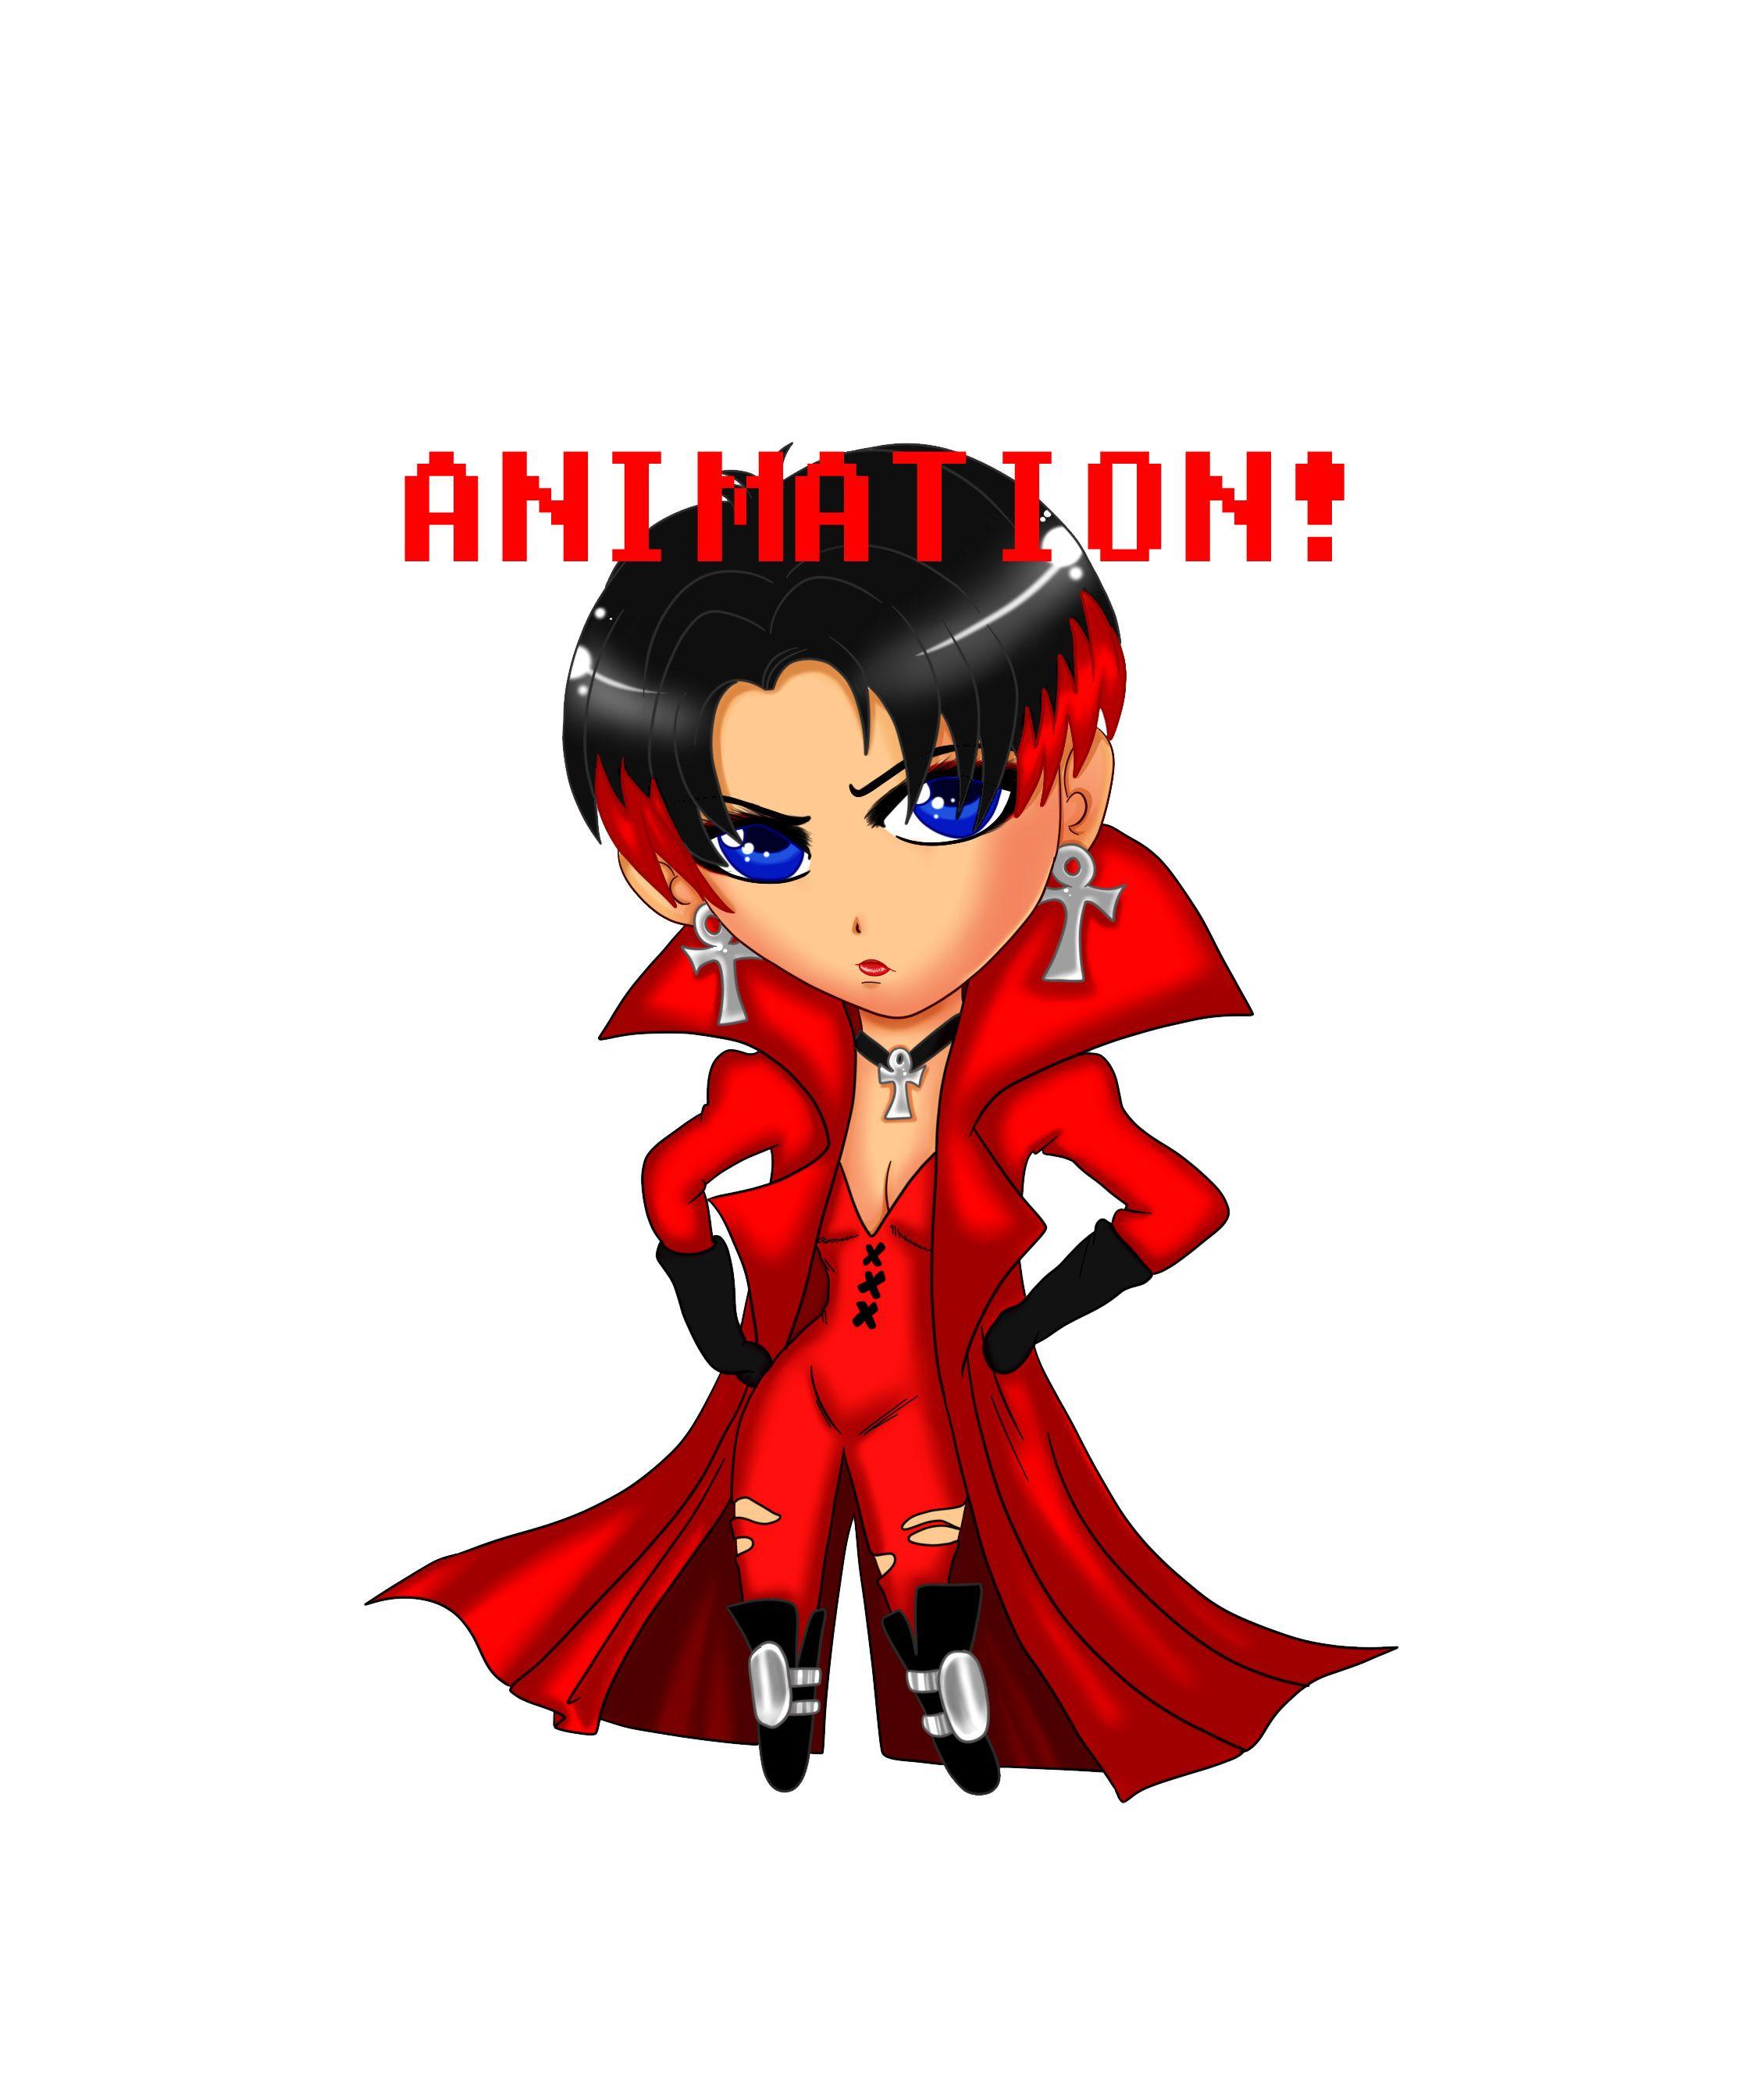 XMen Chibi: The Scarlet Witch Animation by JassyCoCo.deviantart.com on @deviantART